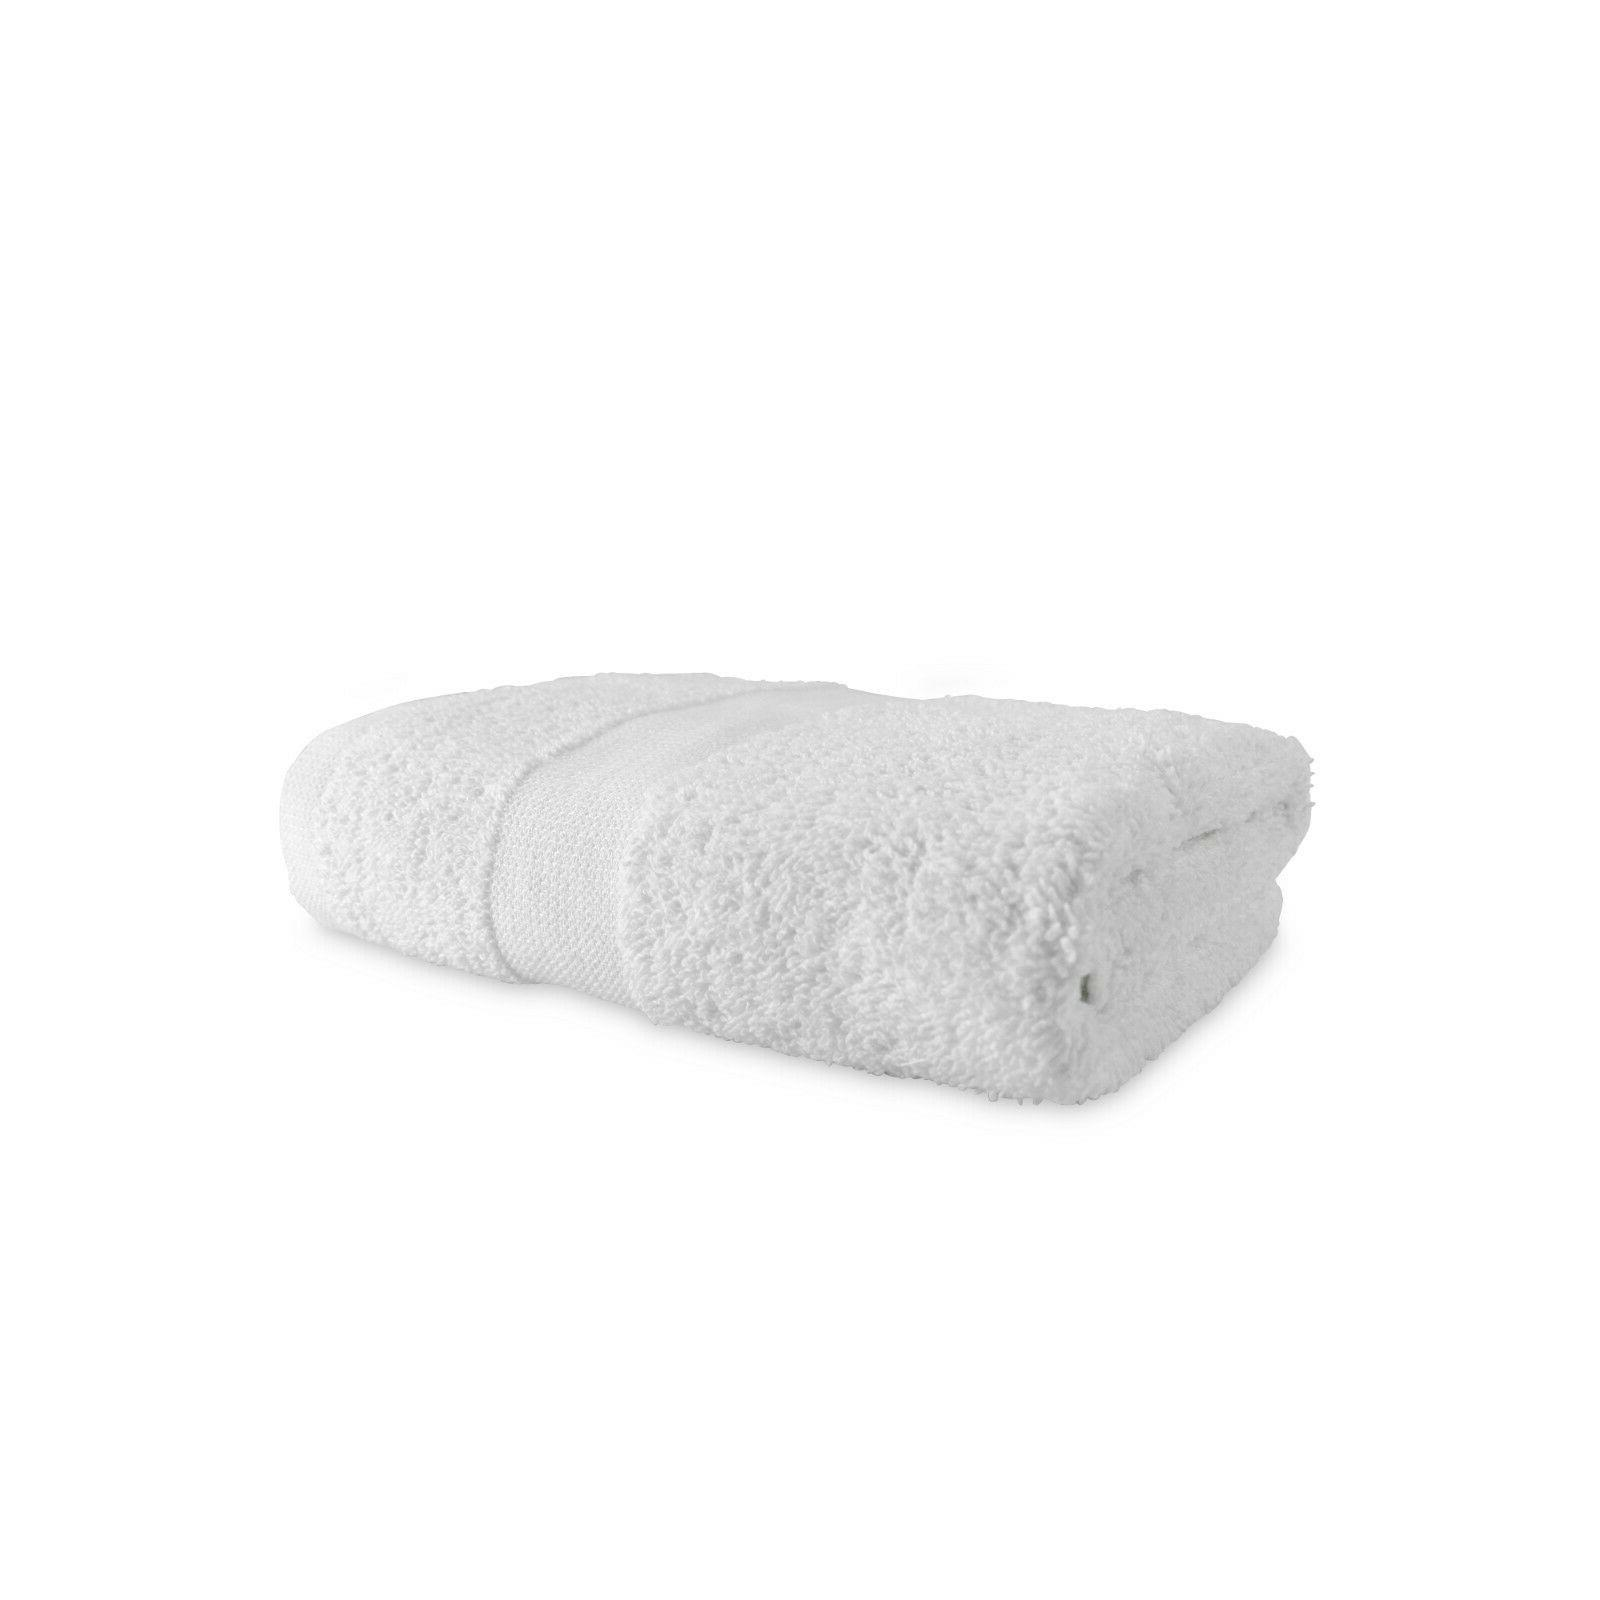 Case of Hand - White Multi-Purpose Bathroom Wholesale